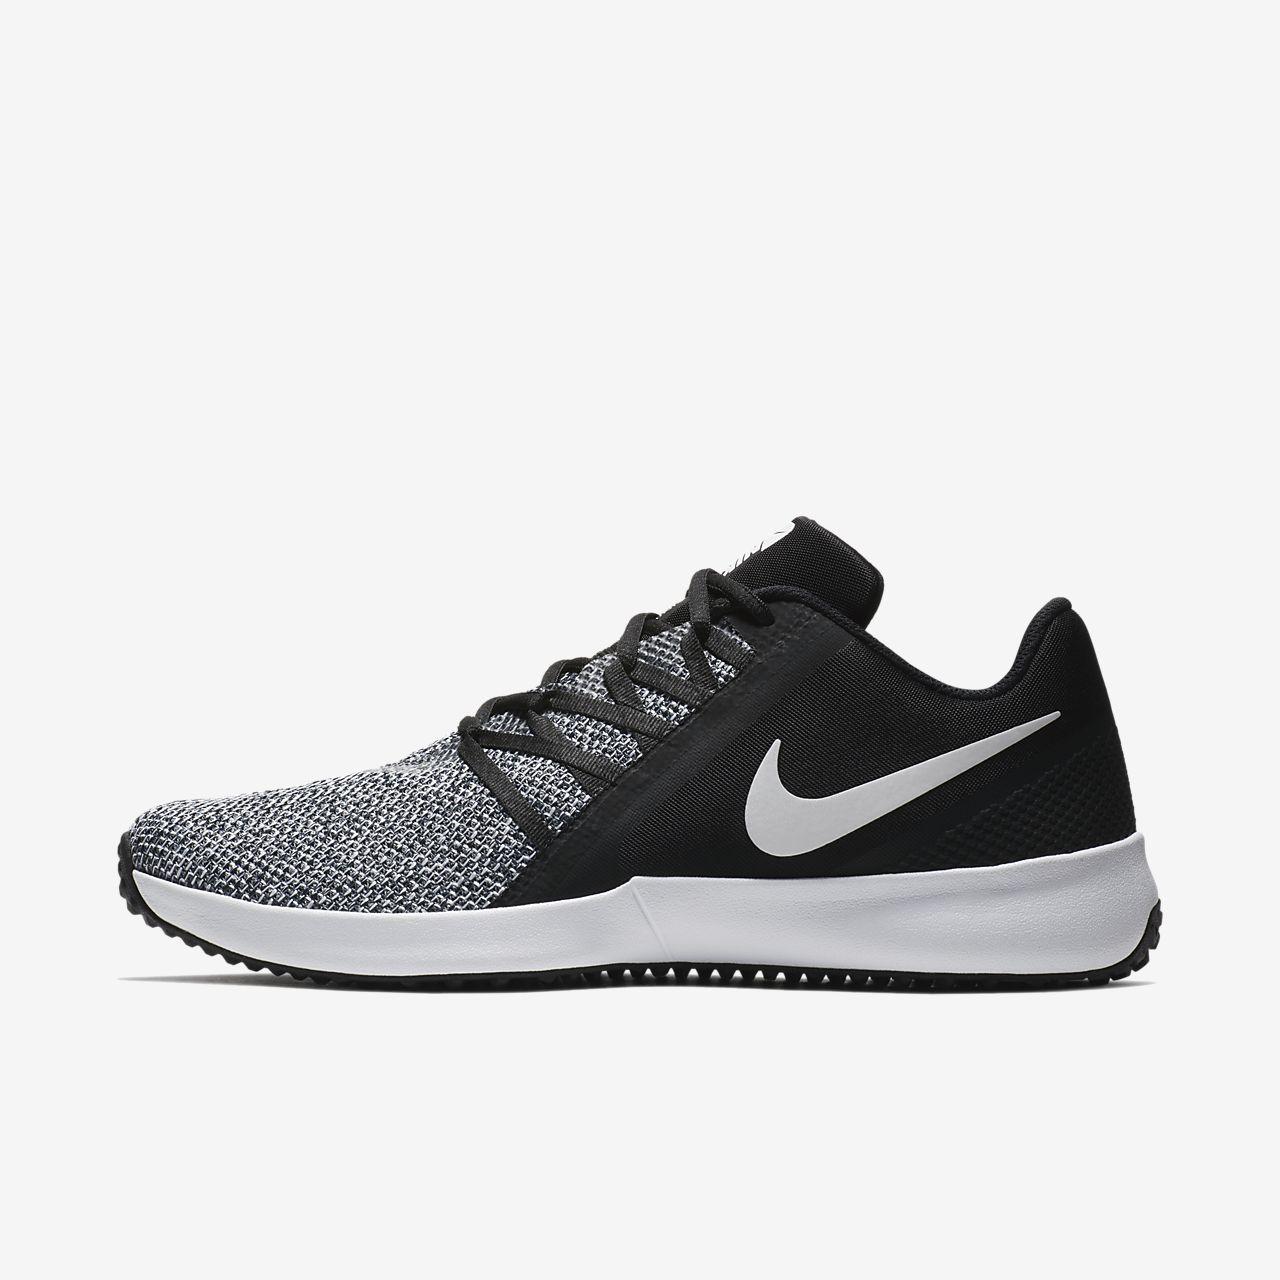 Chaussure de training sportif et fitness Nike Varsity Complete ...